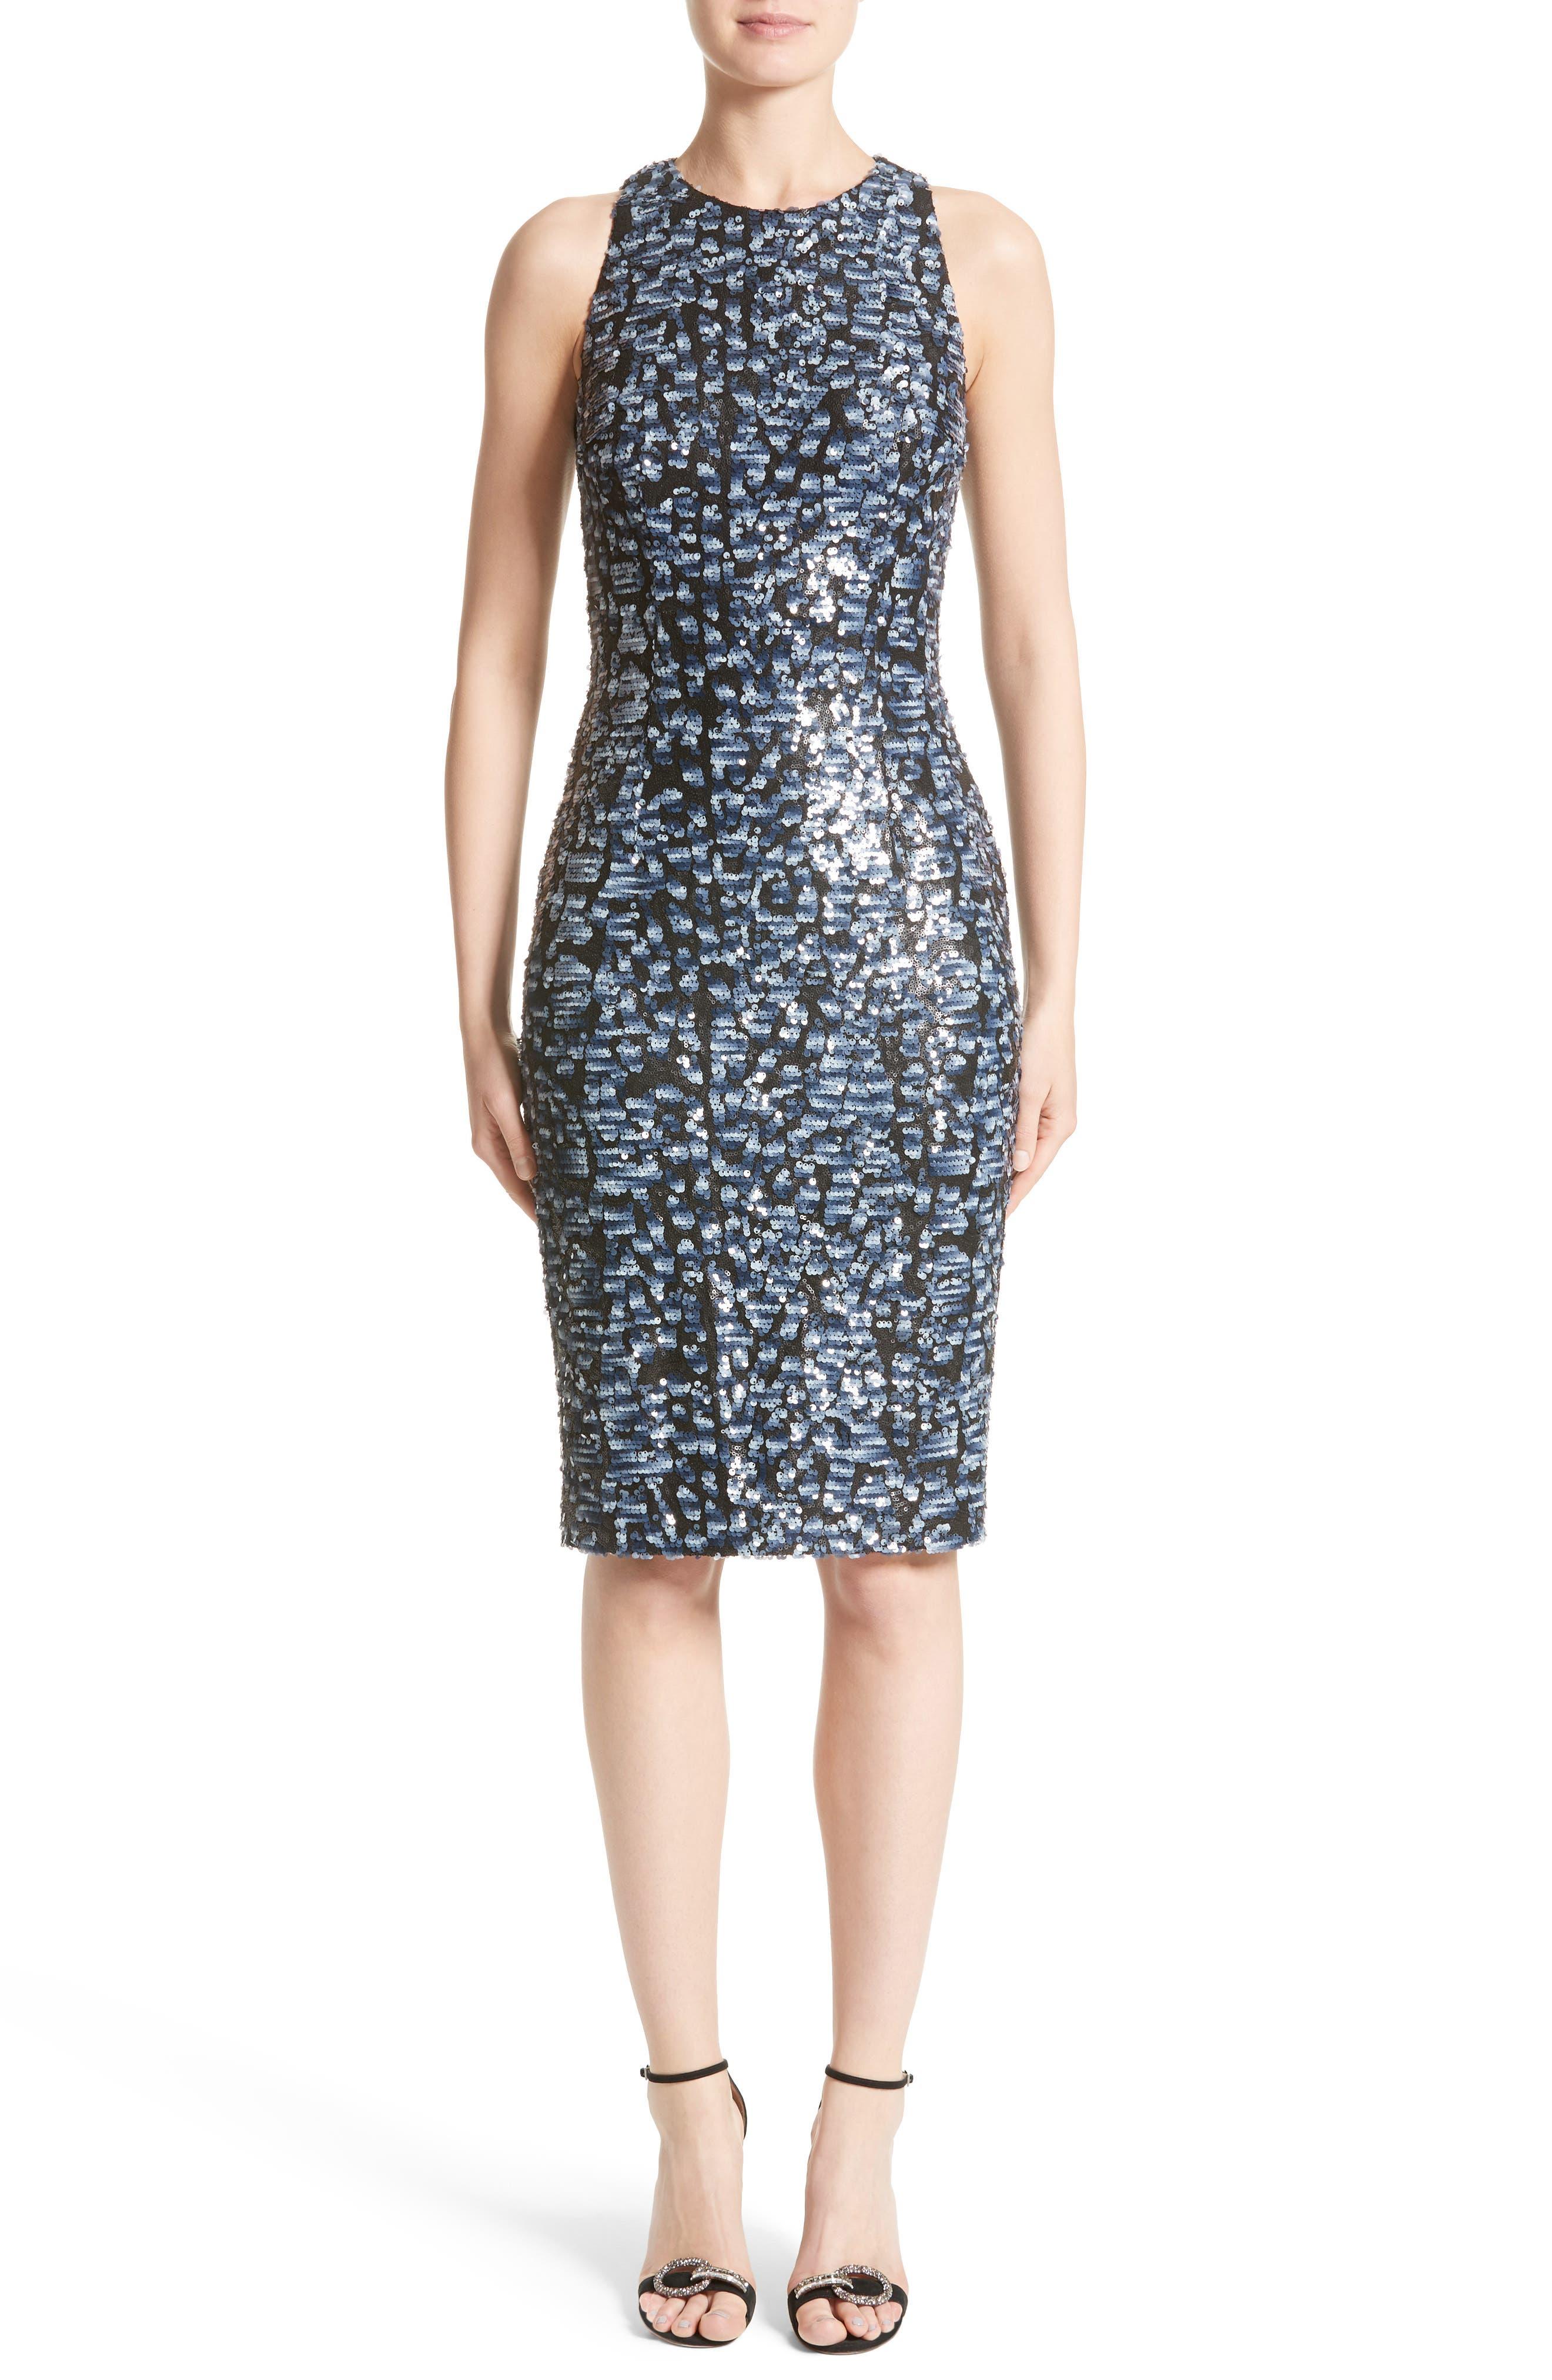 Carmen Marc Valvo Couture Sequin Sheath Dress